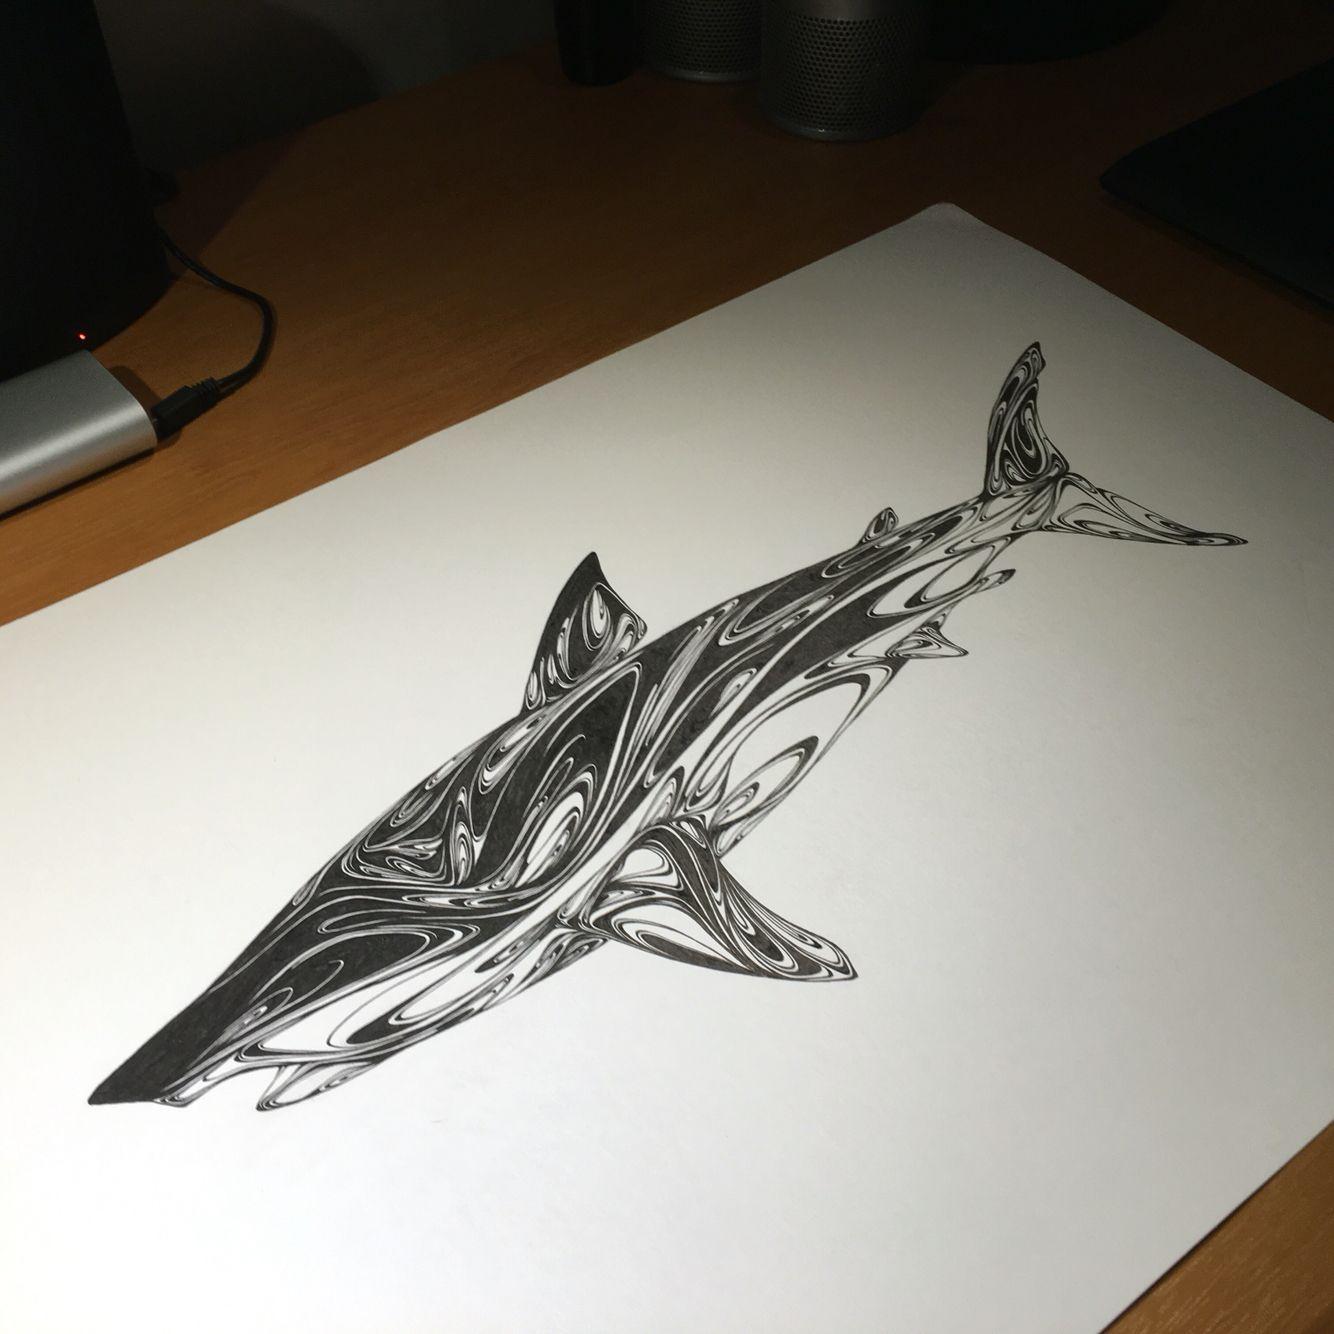 Carcharodon carcharias / Great white shark 완성했지만 제대로 공개는 겨울 블랙펜 정기전에서... #일러스트 #펜화 #작업 #그림 #손그림 #상어 #백상아리 #야작 #펜